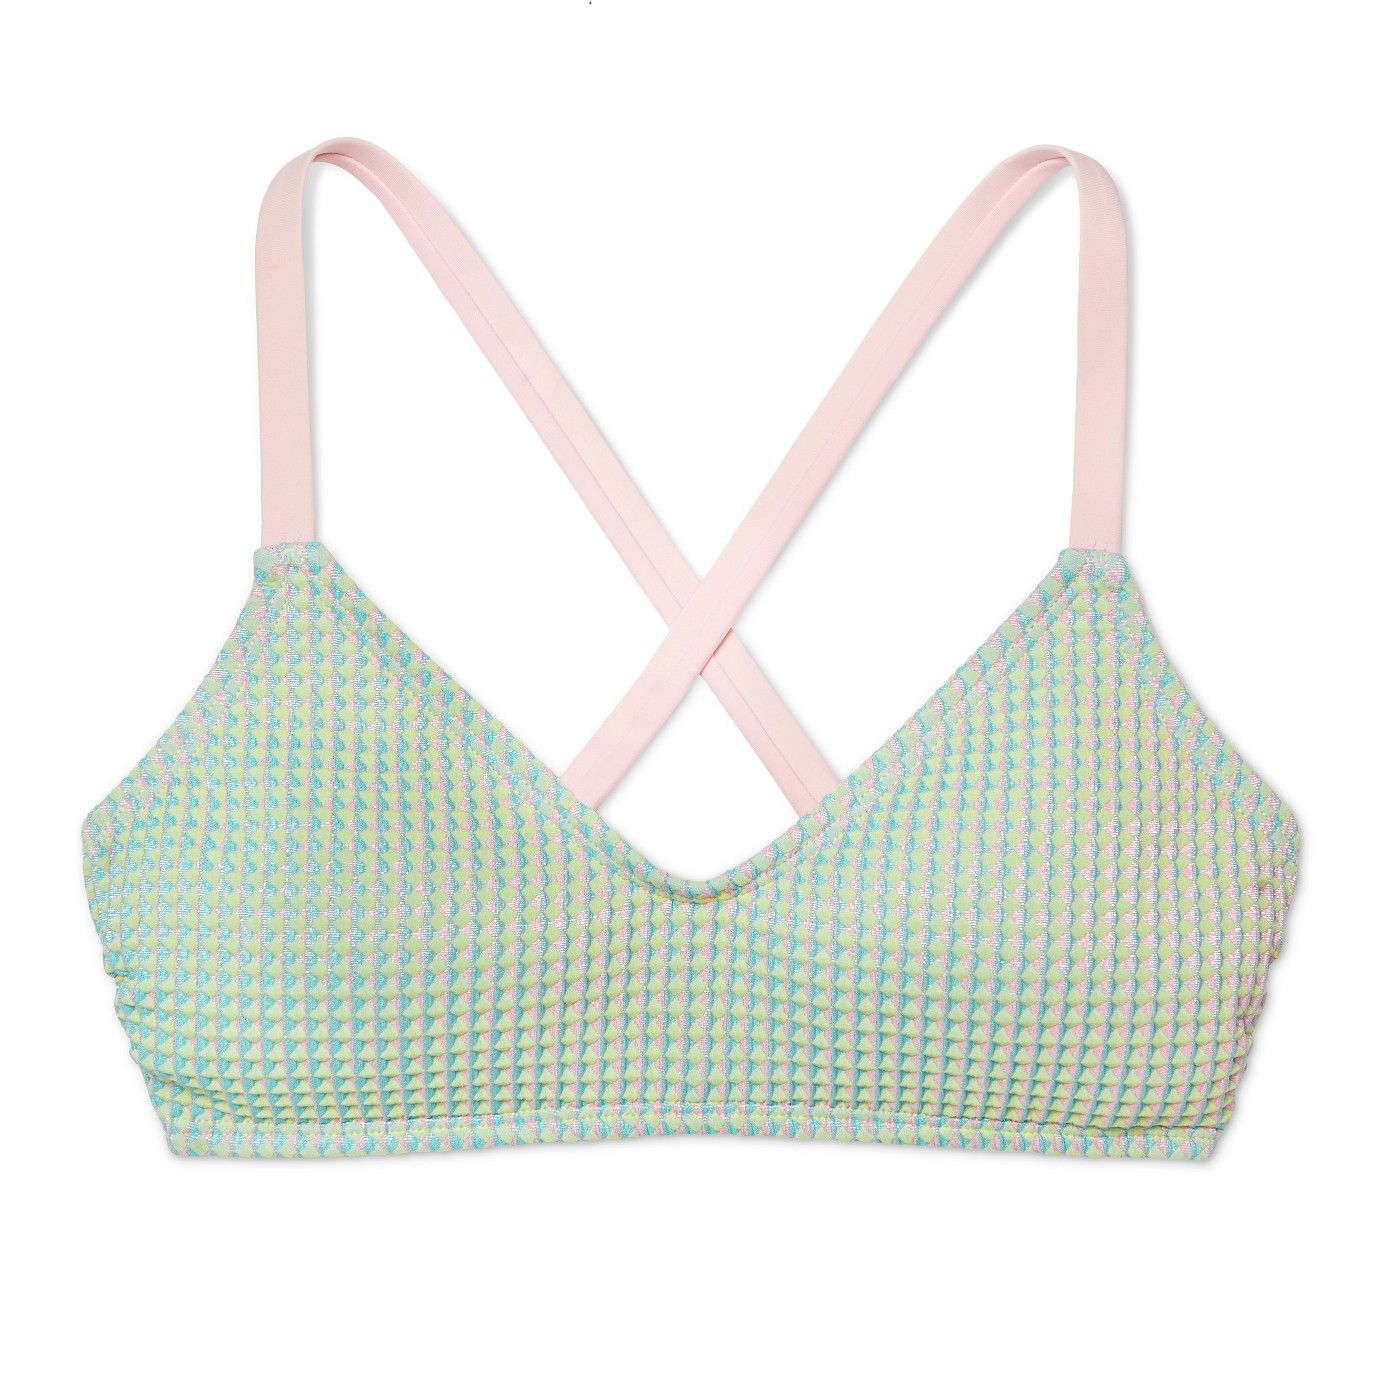 48d97b1fa717e Women s Textured Metallic Bralette Bikini Top - Xhilaration  Metallic Multi  XS  Metallic